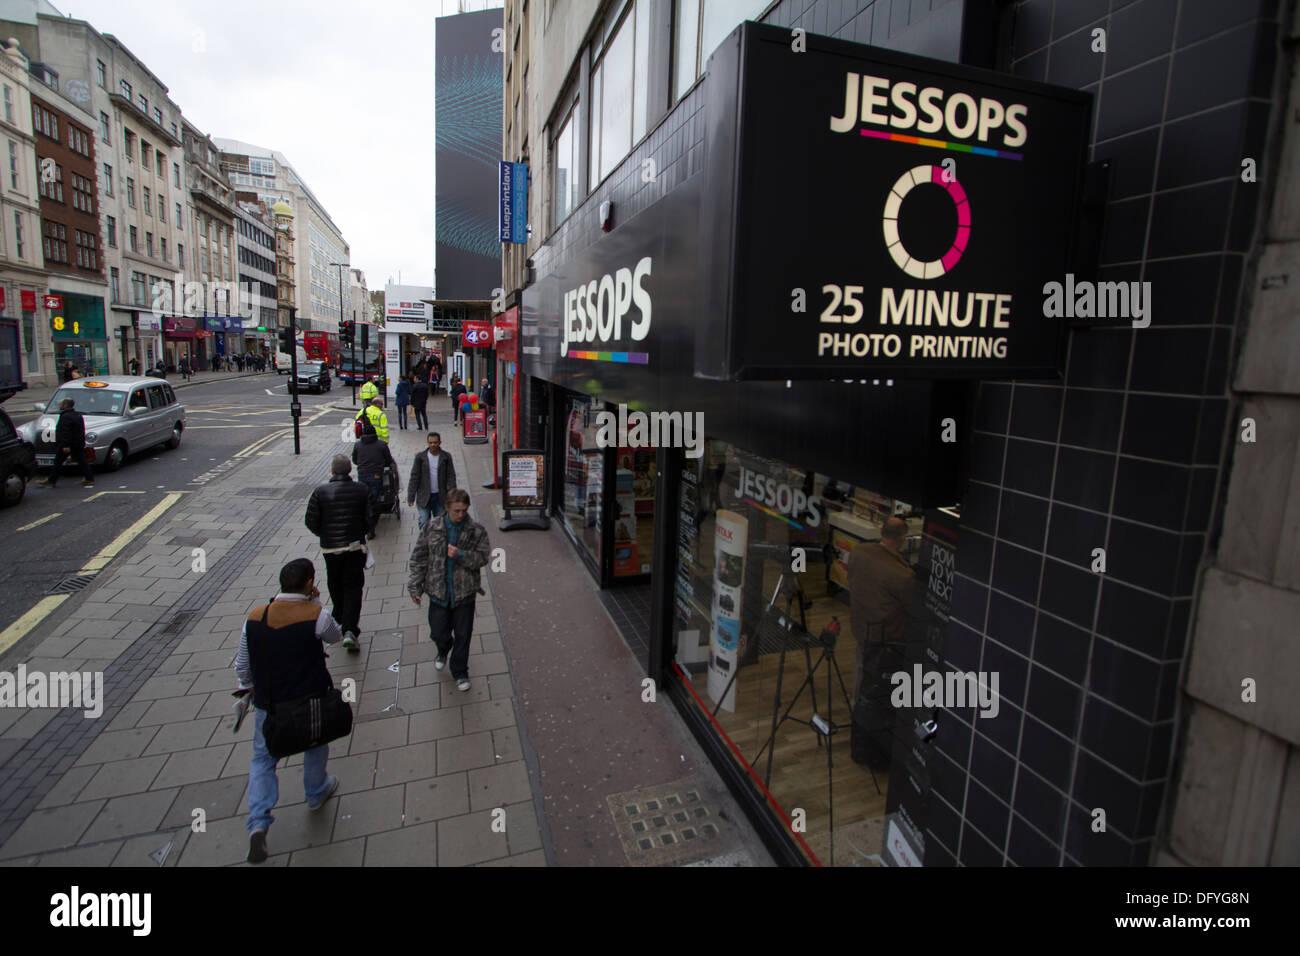 Jessops sortie photographique Oxford Street Londres Photo Stock